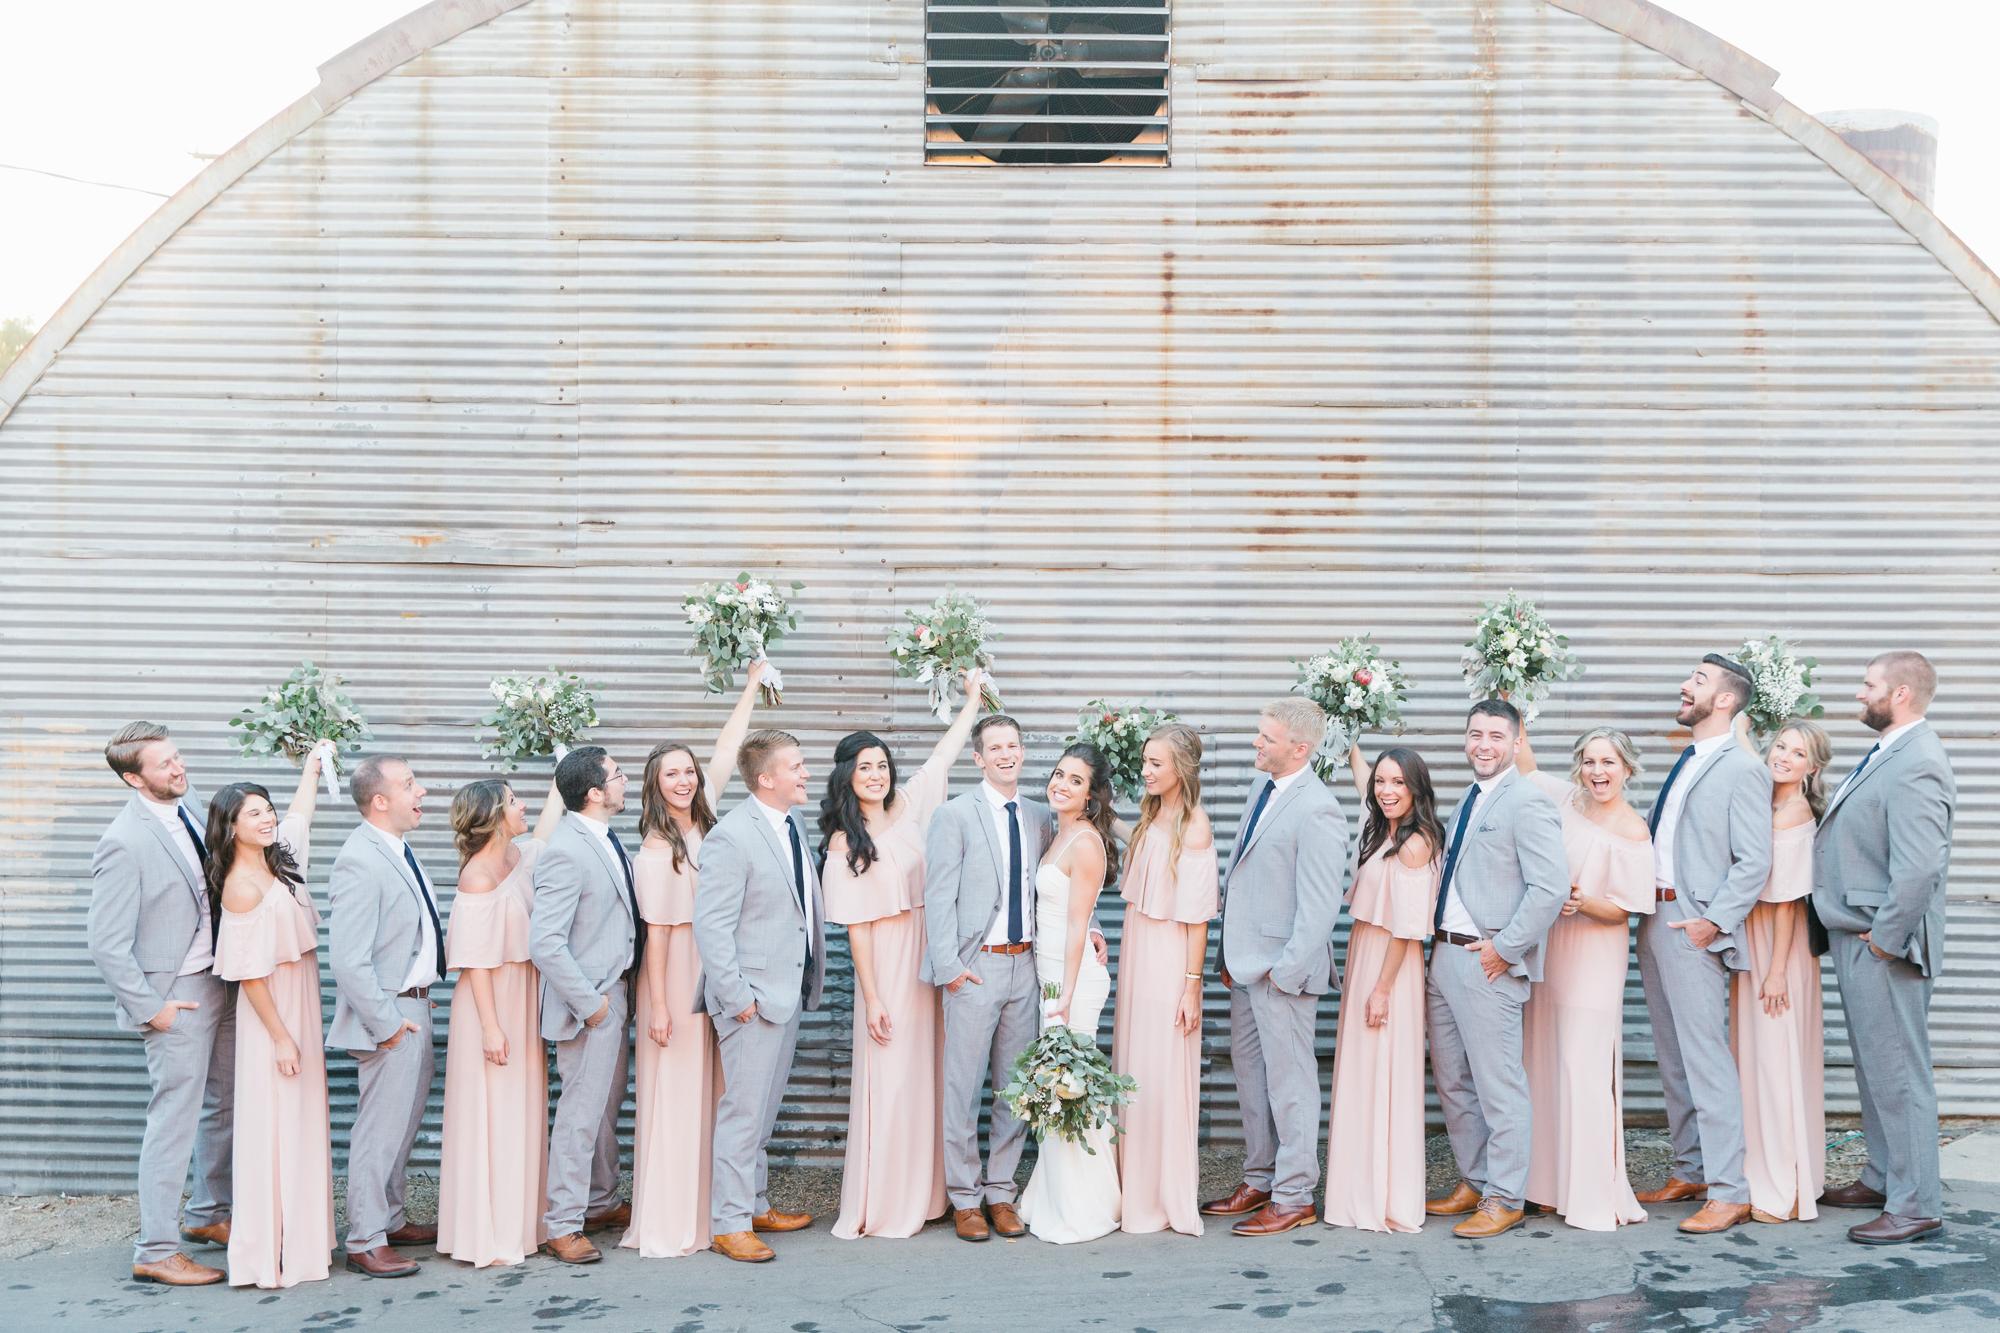 los-angeles-wedding-photographer-9.jpg